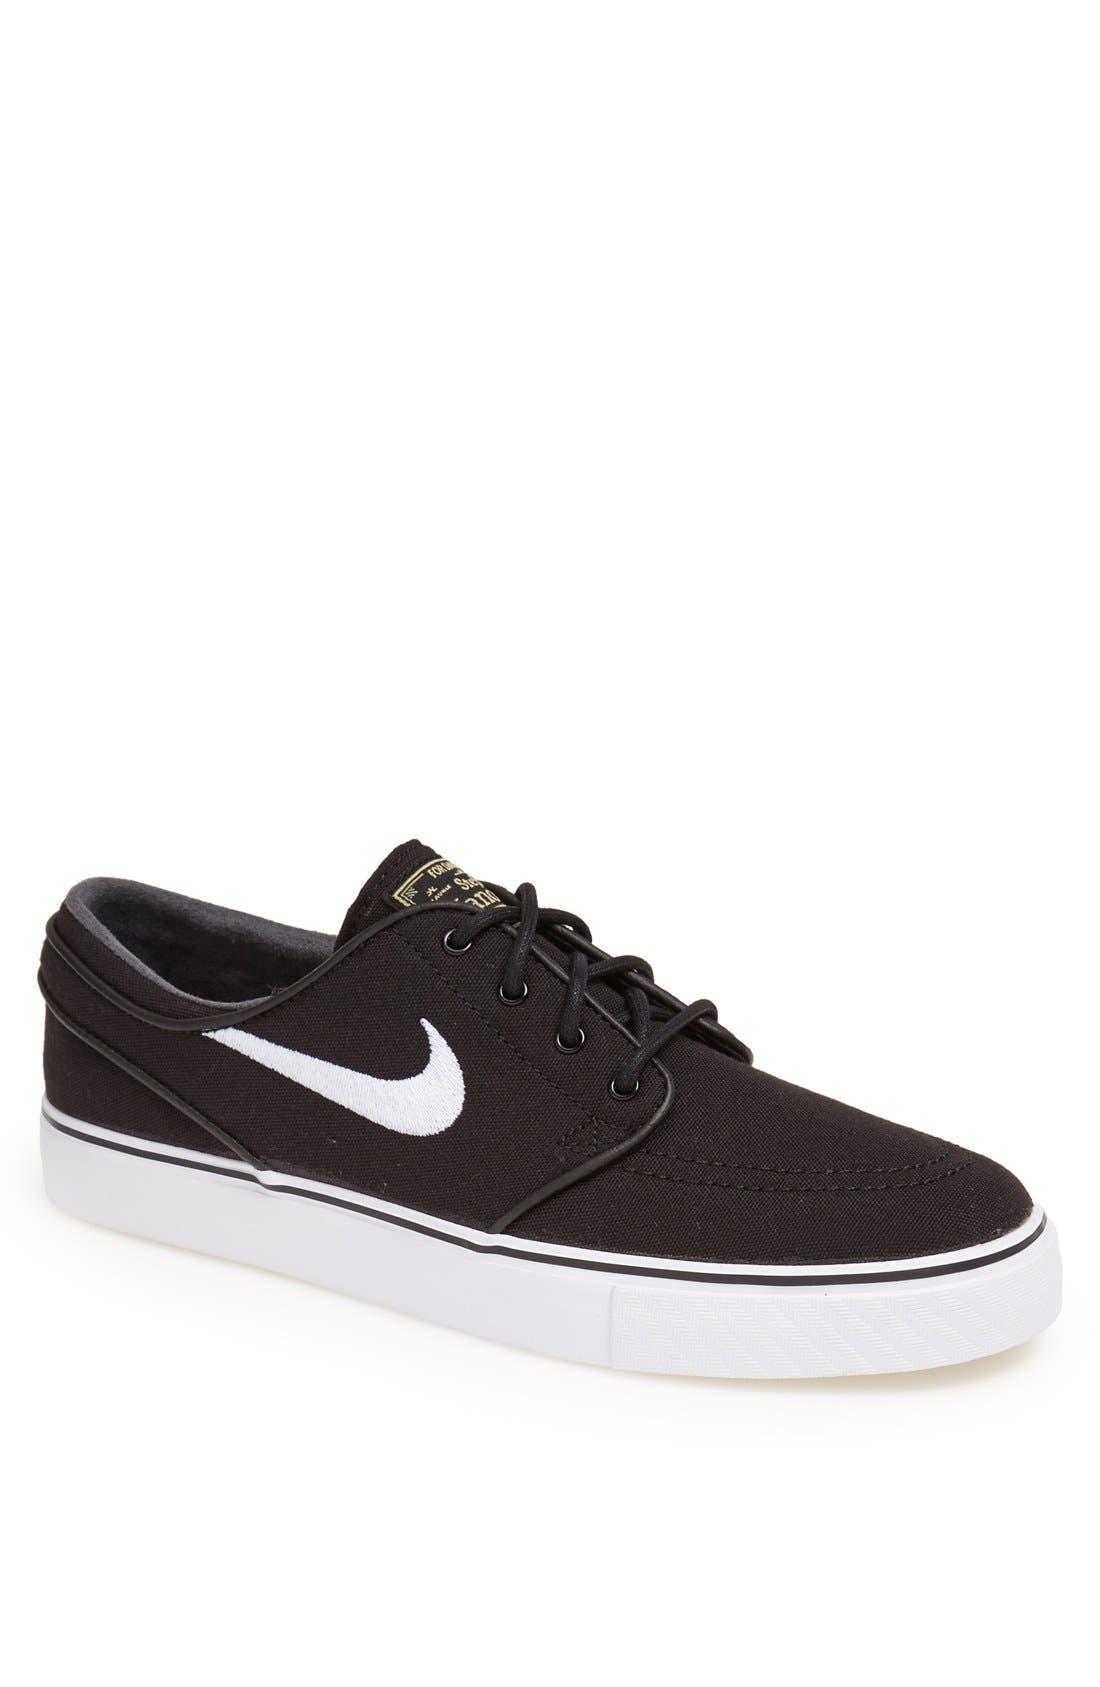 Main Image - Nike 'Zoom - Stefan Janoski SB' Canvas Skate Shoe